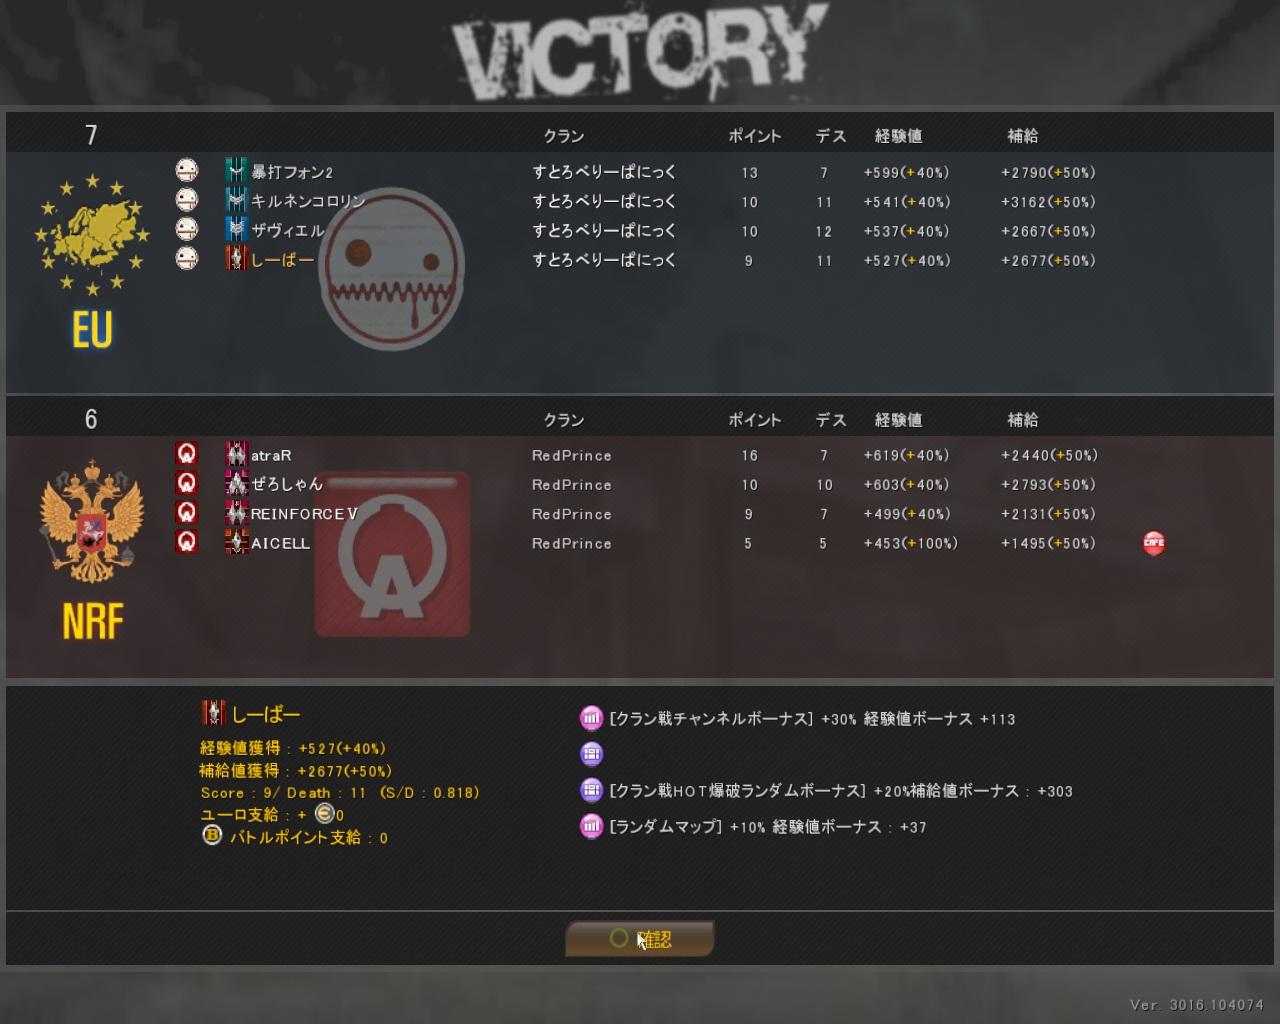 RedPrince